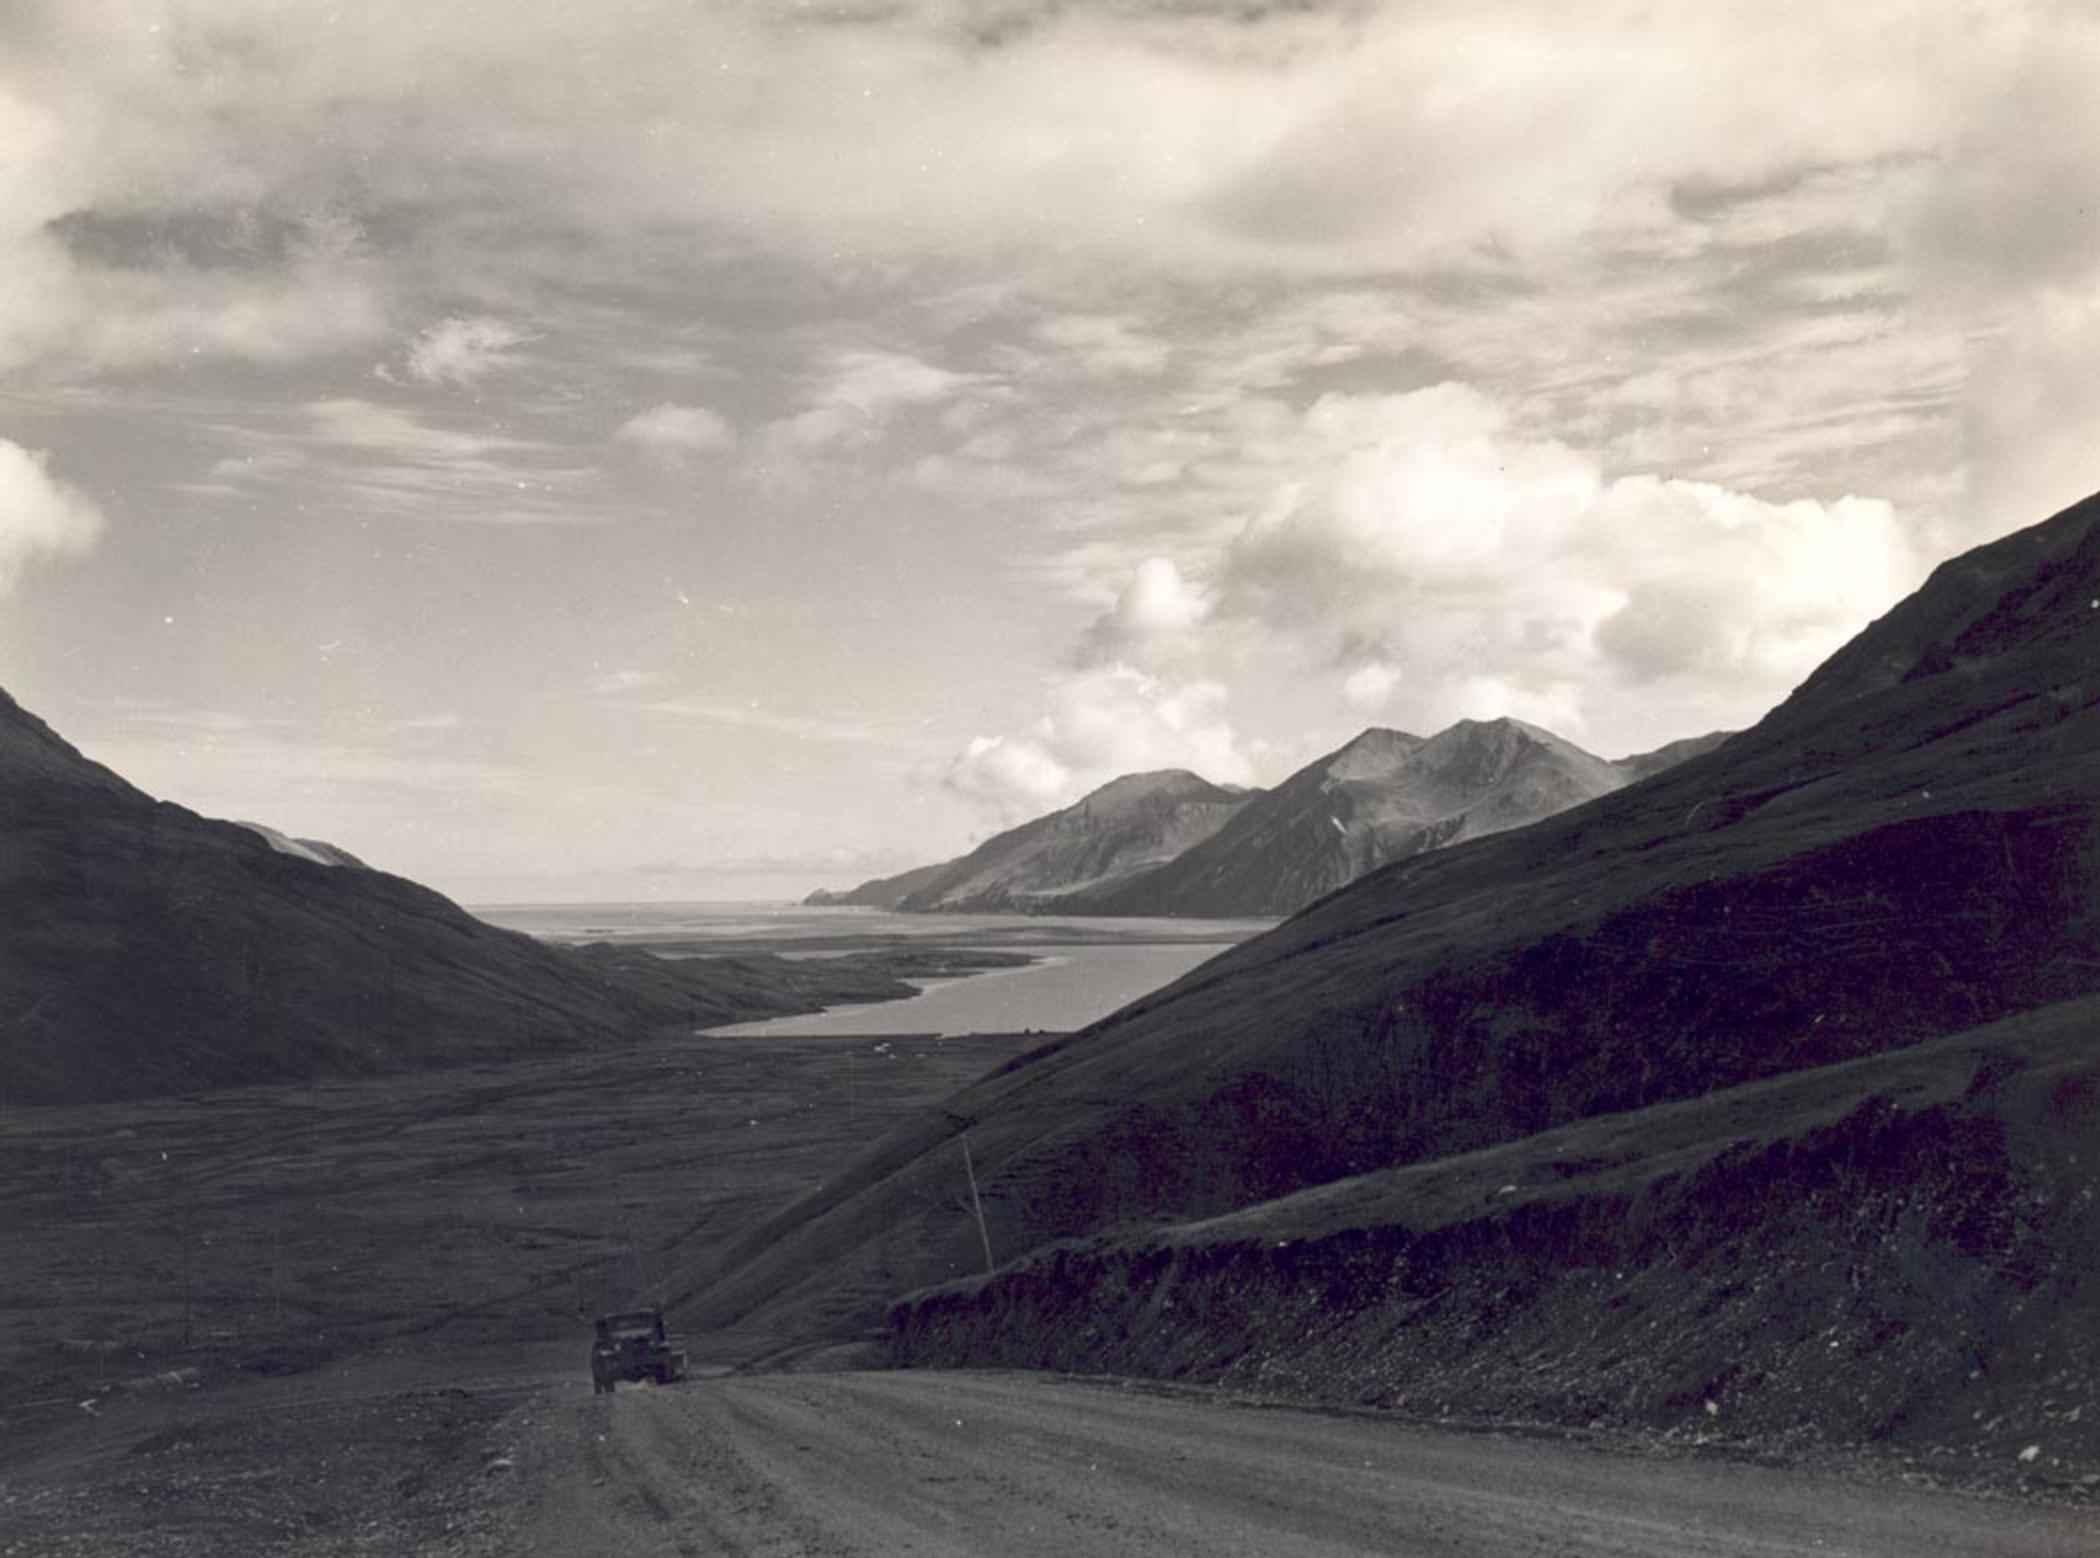 File:Landscape scenics vintage road photo.jpg - Wikimedia ...